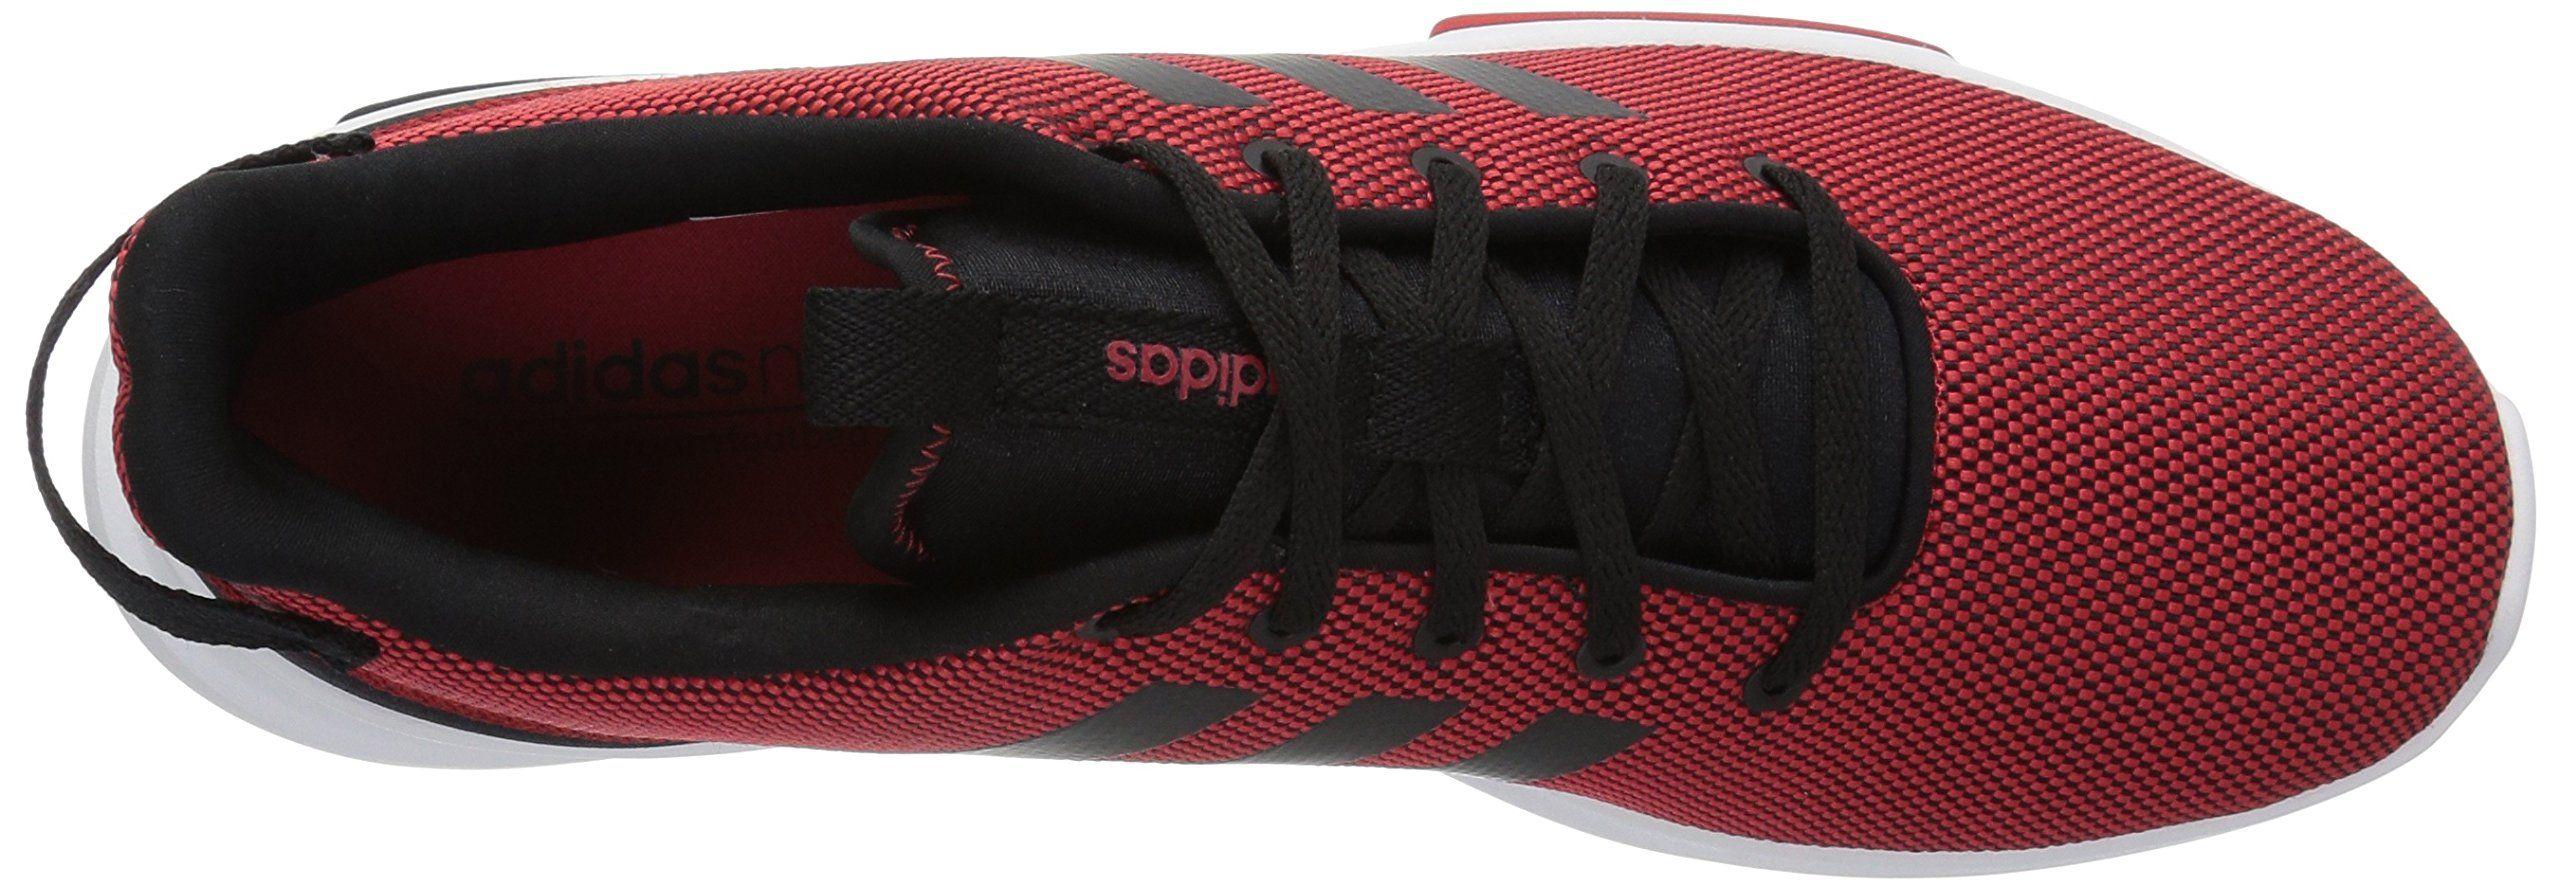 007030542cd098 adidas Mens CF Racer TR Running Shoes Scarlet Black White 10 M US ...